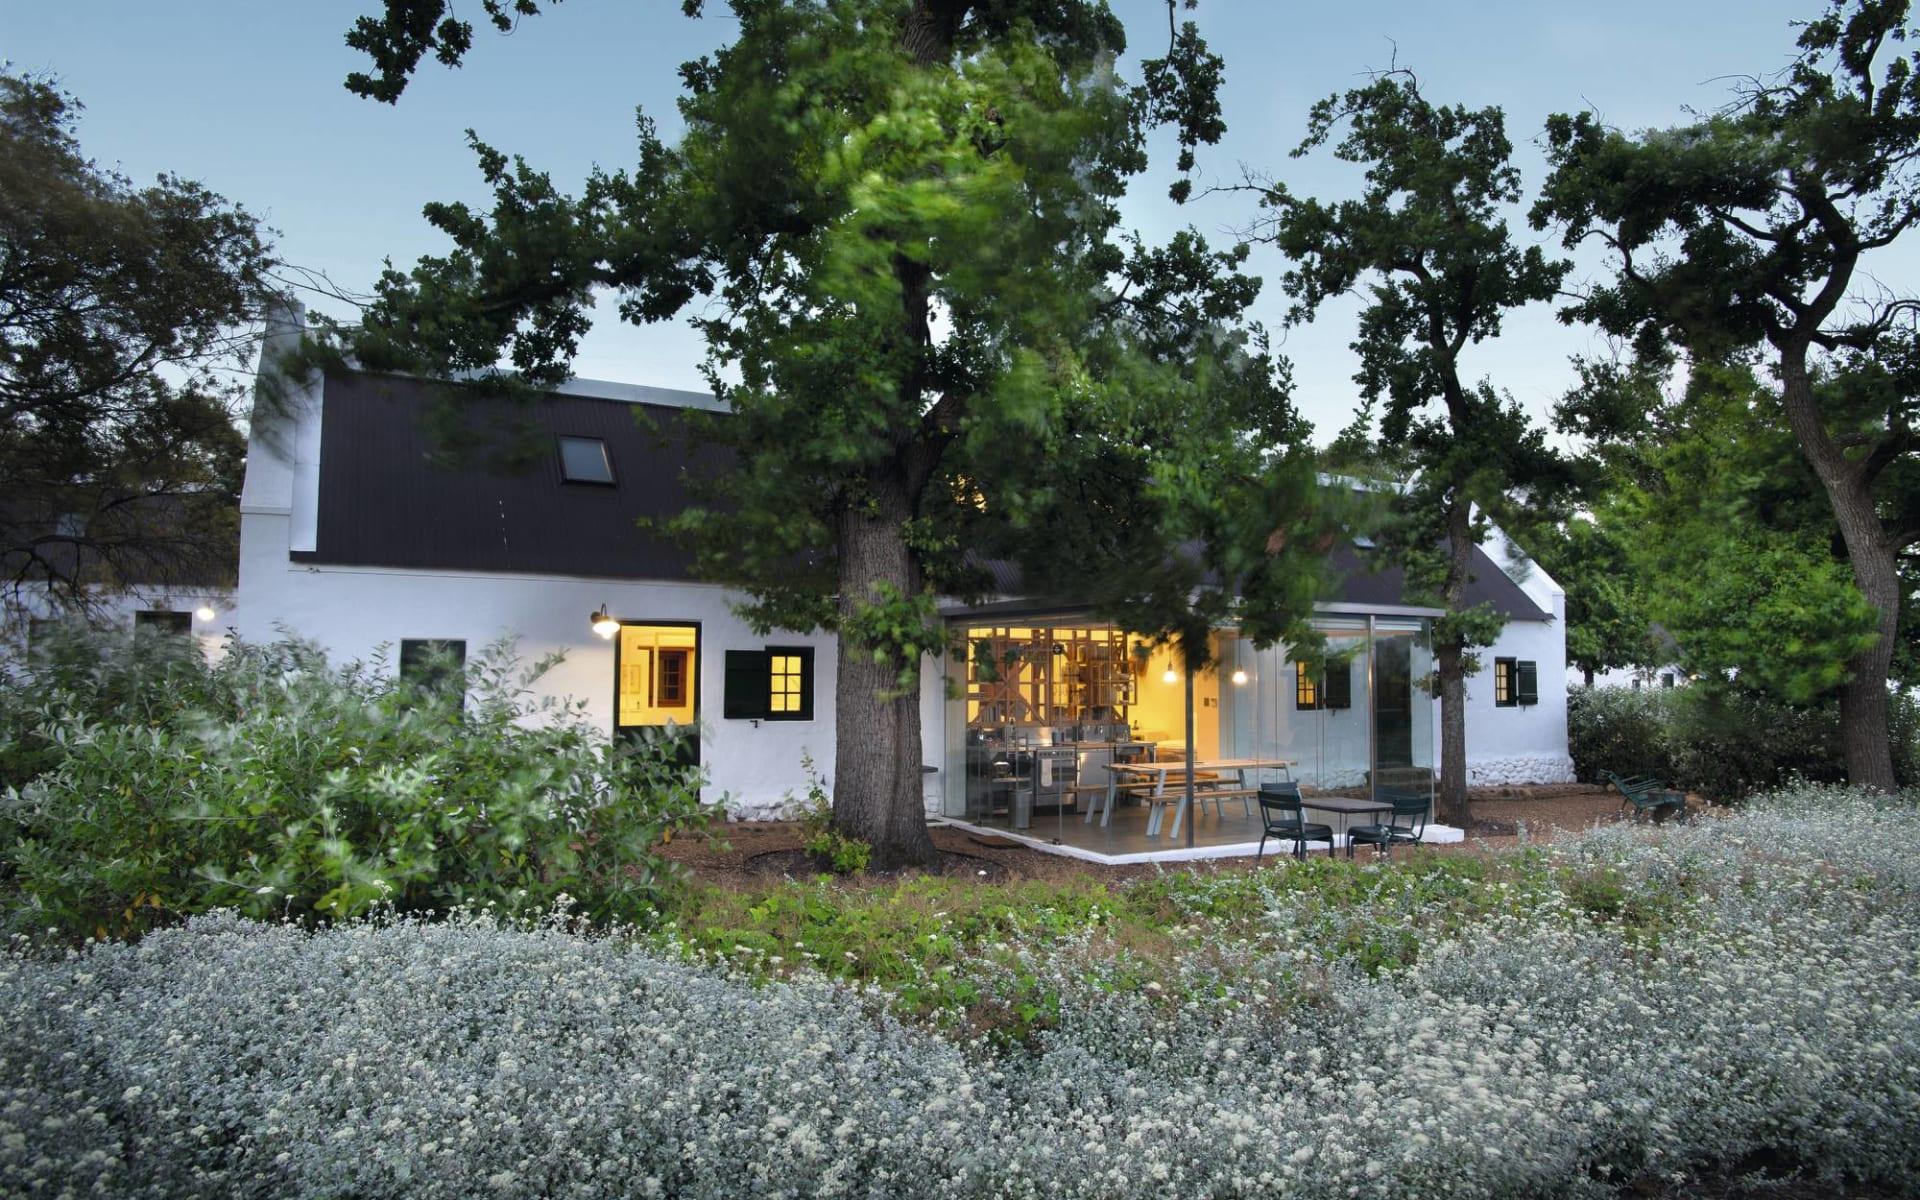 Babylonstoren Farm Hotel in Paarl:  Babylonstoren - Cottage